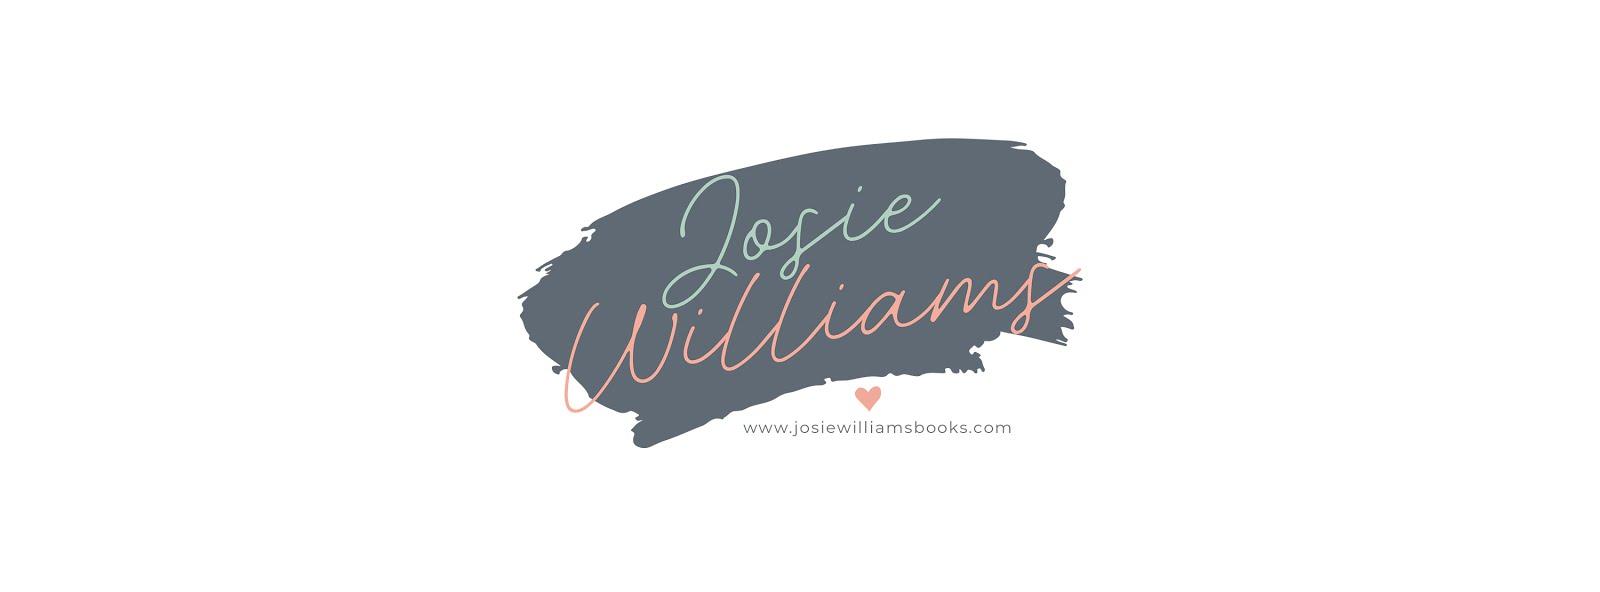 Josie Williams